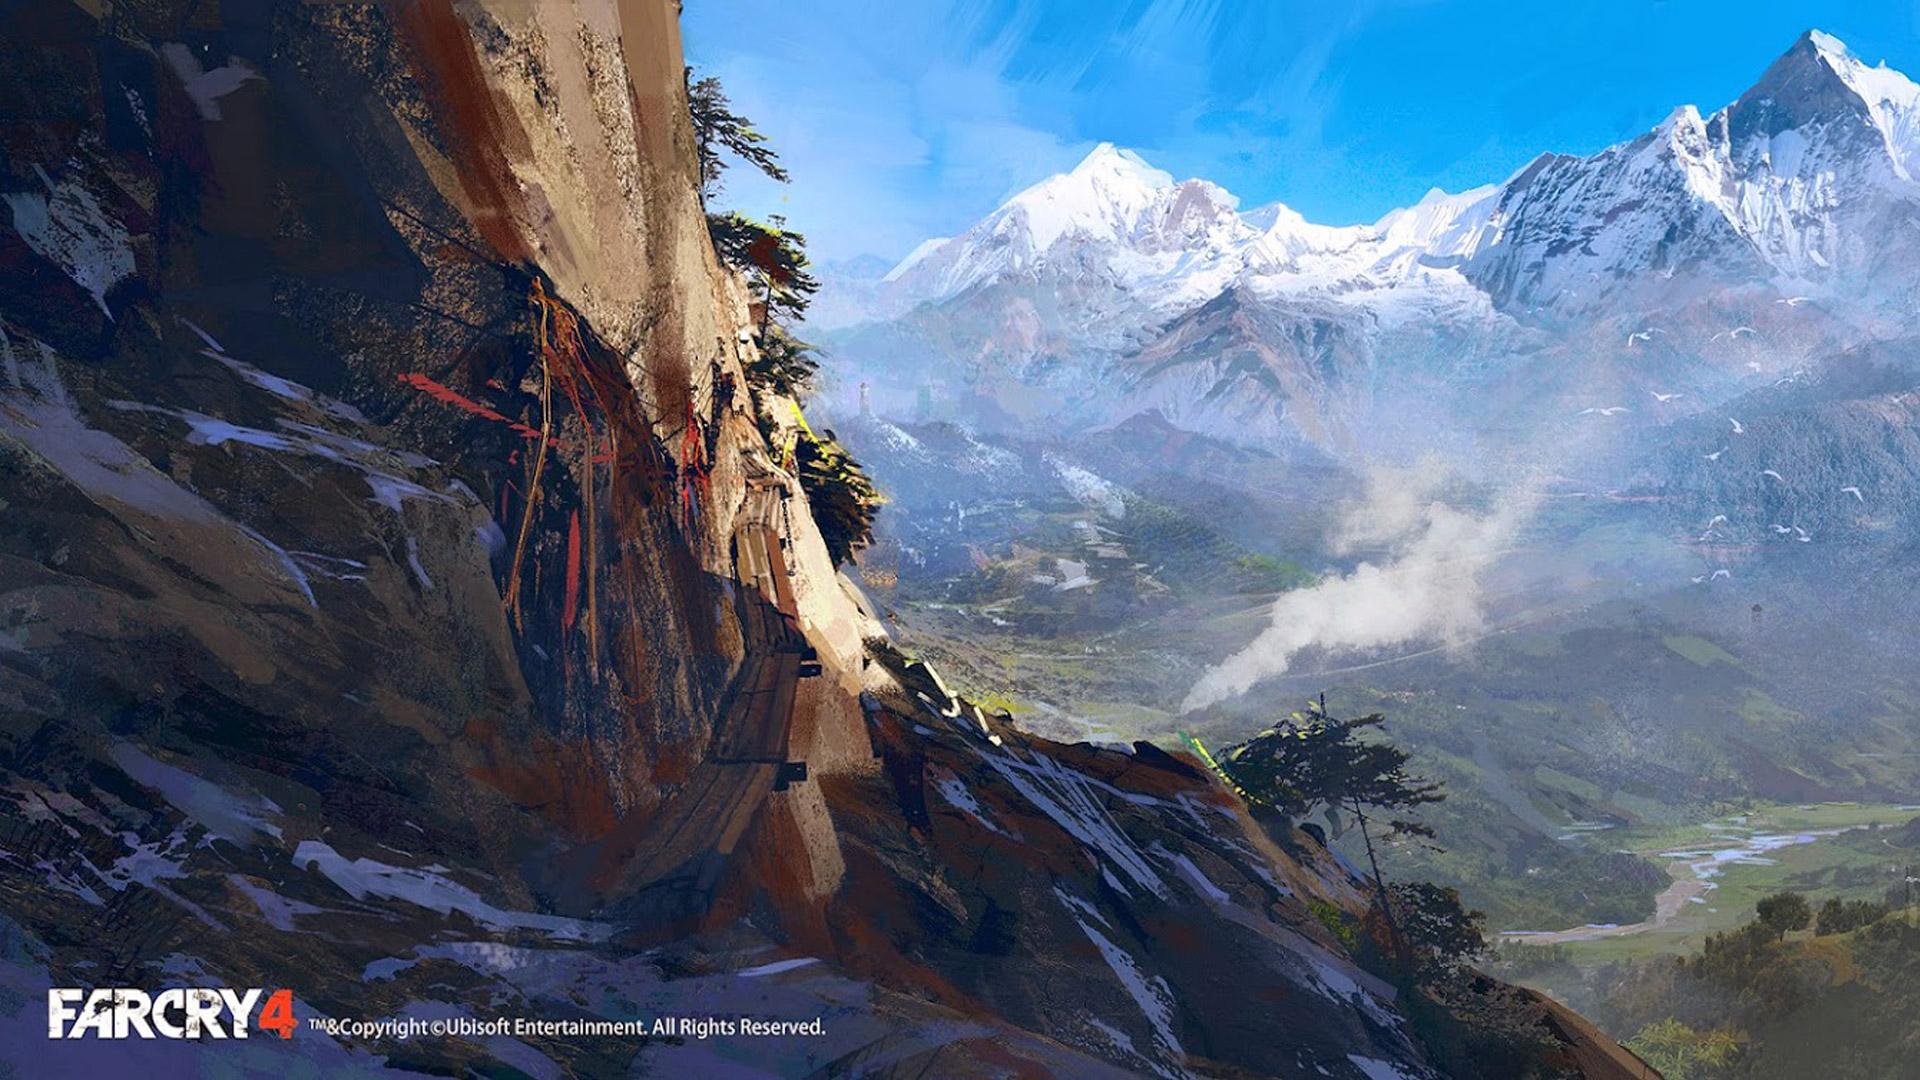 Far Cry 4 Wallpaper: Far Cry 3 Wallpaper 1920x1080